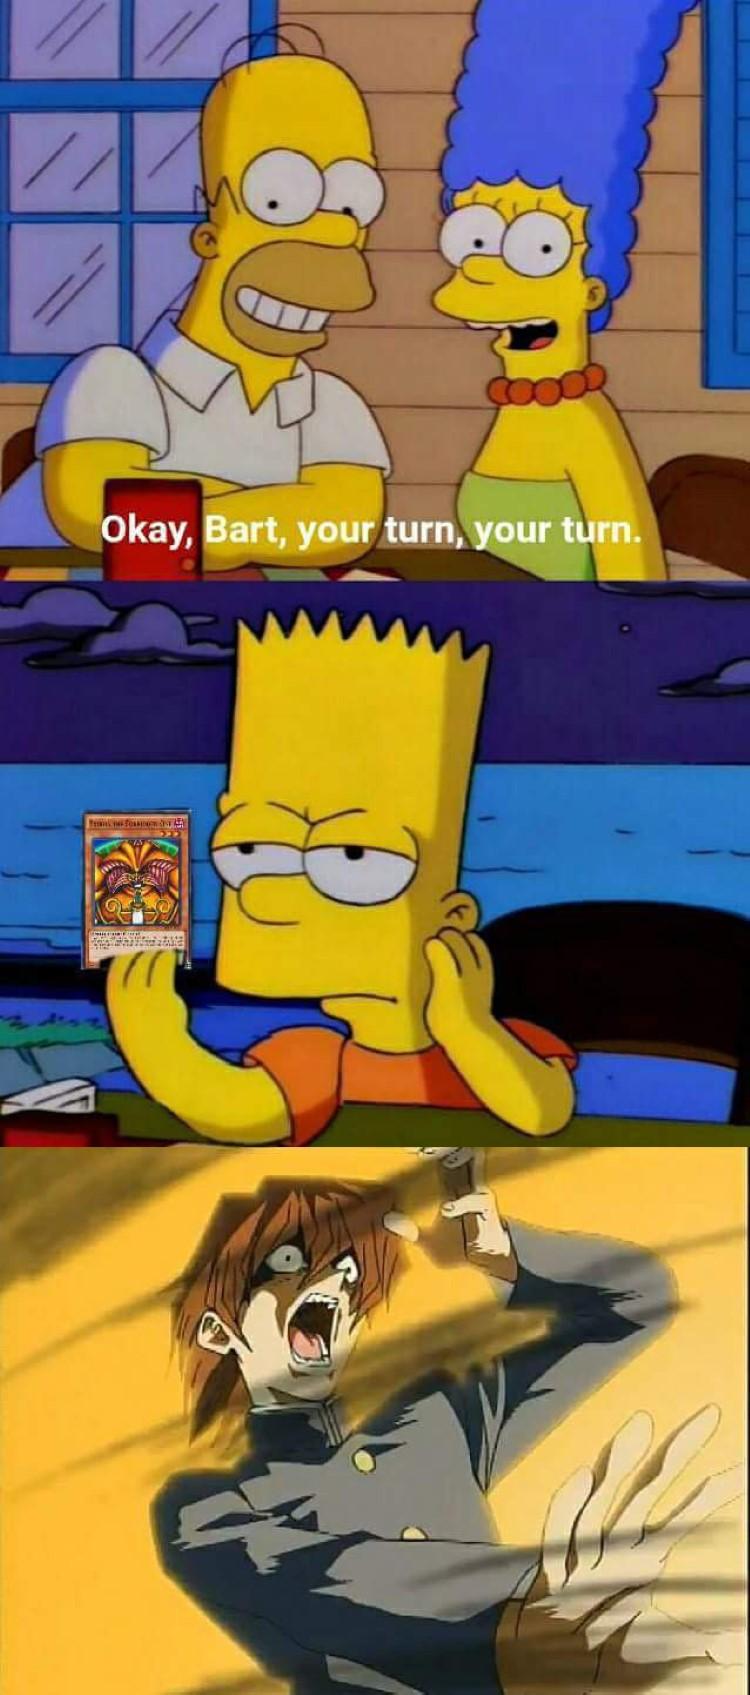 Bart Simpsons Exodia crossover